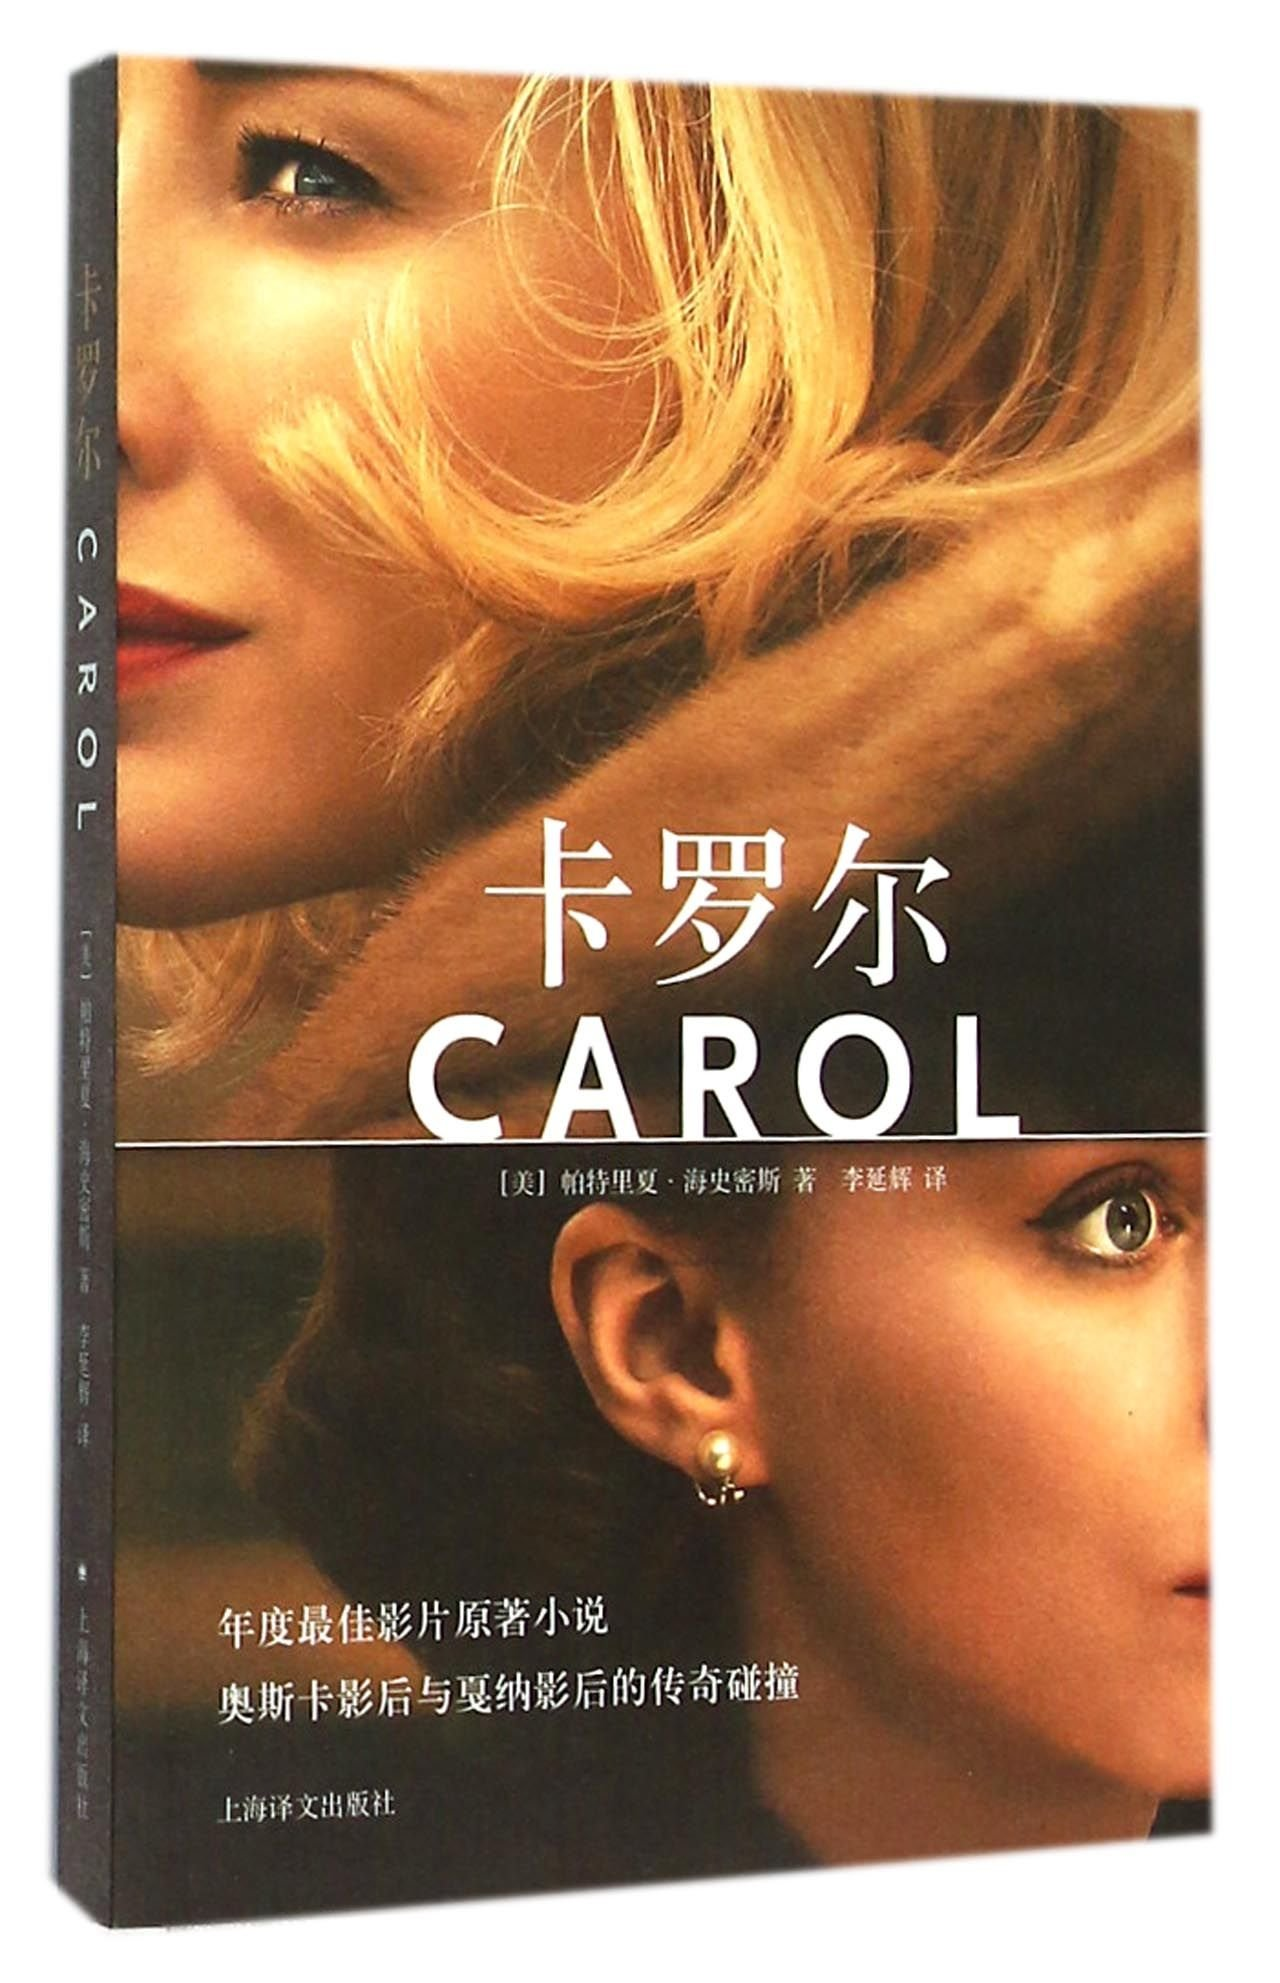 Download Carol (Chinese Edition) PDF